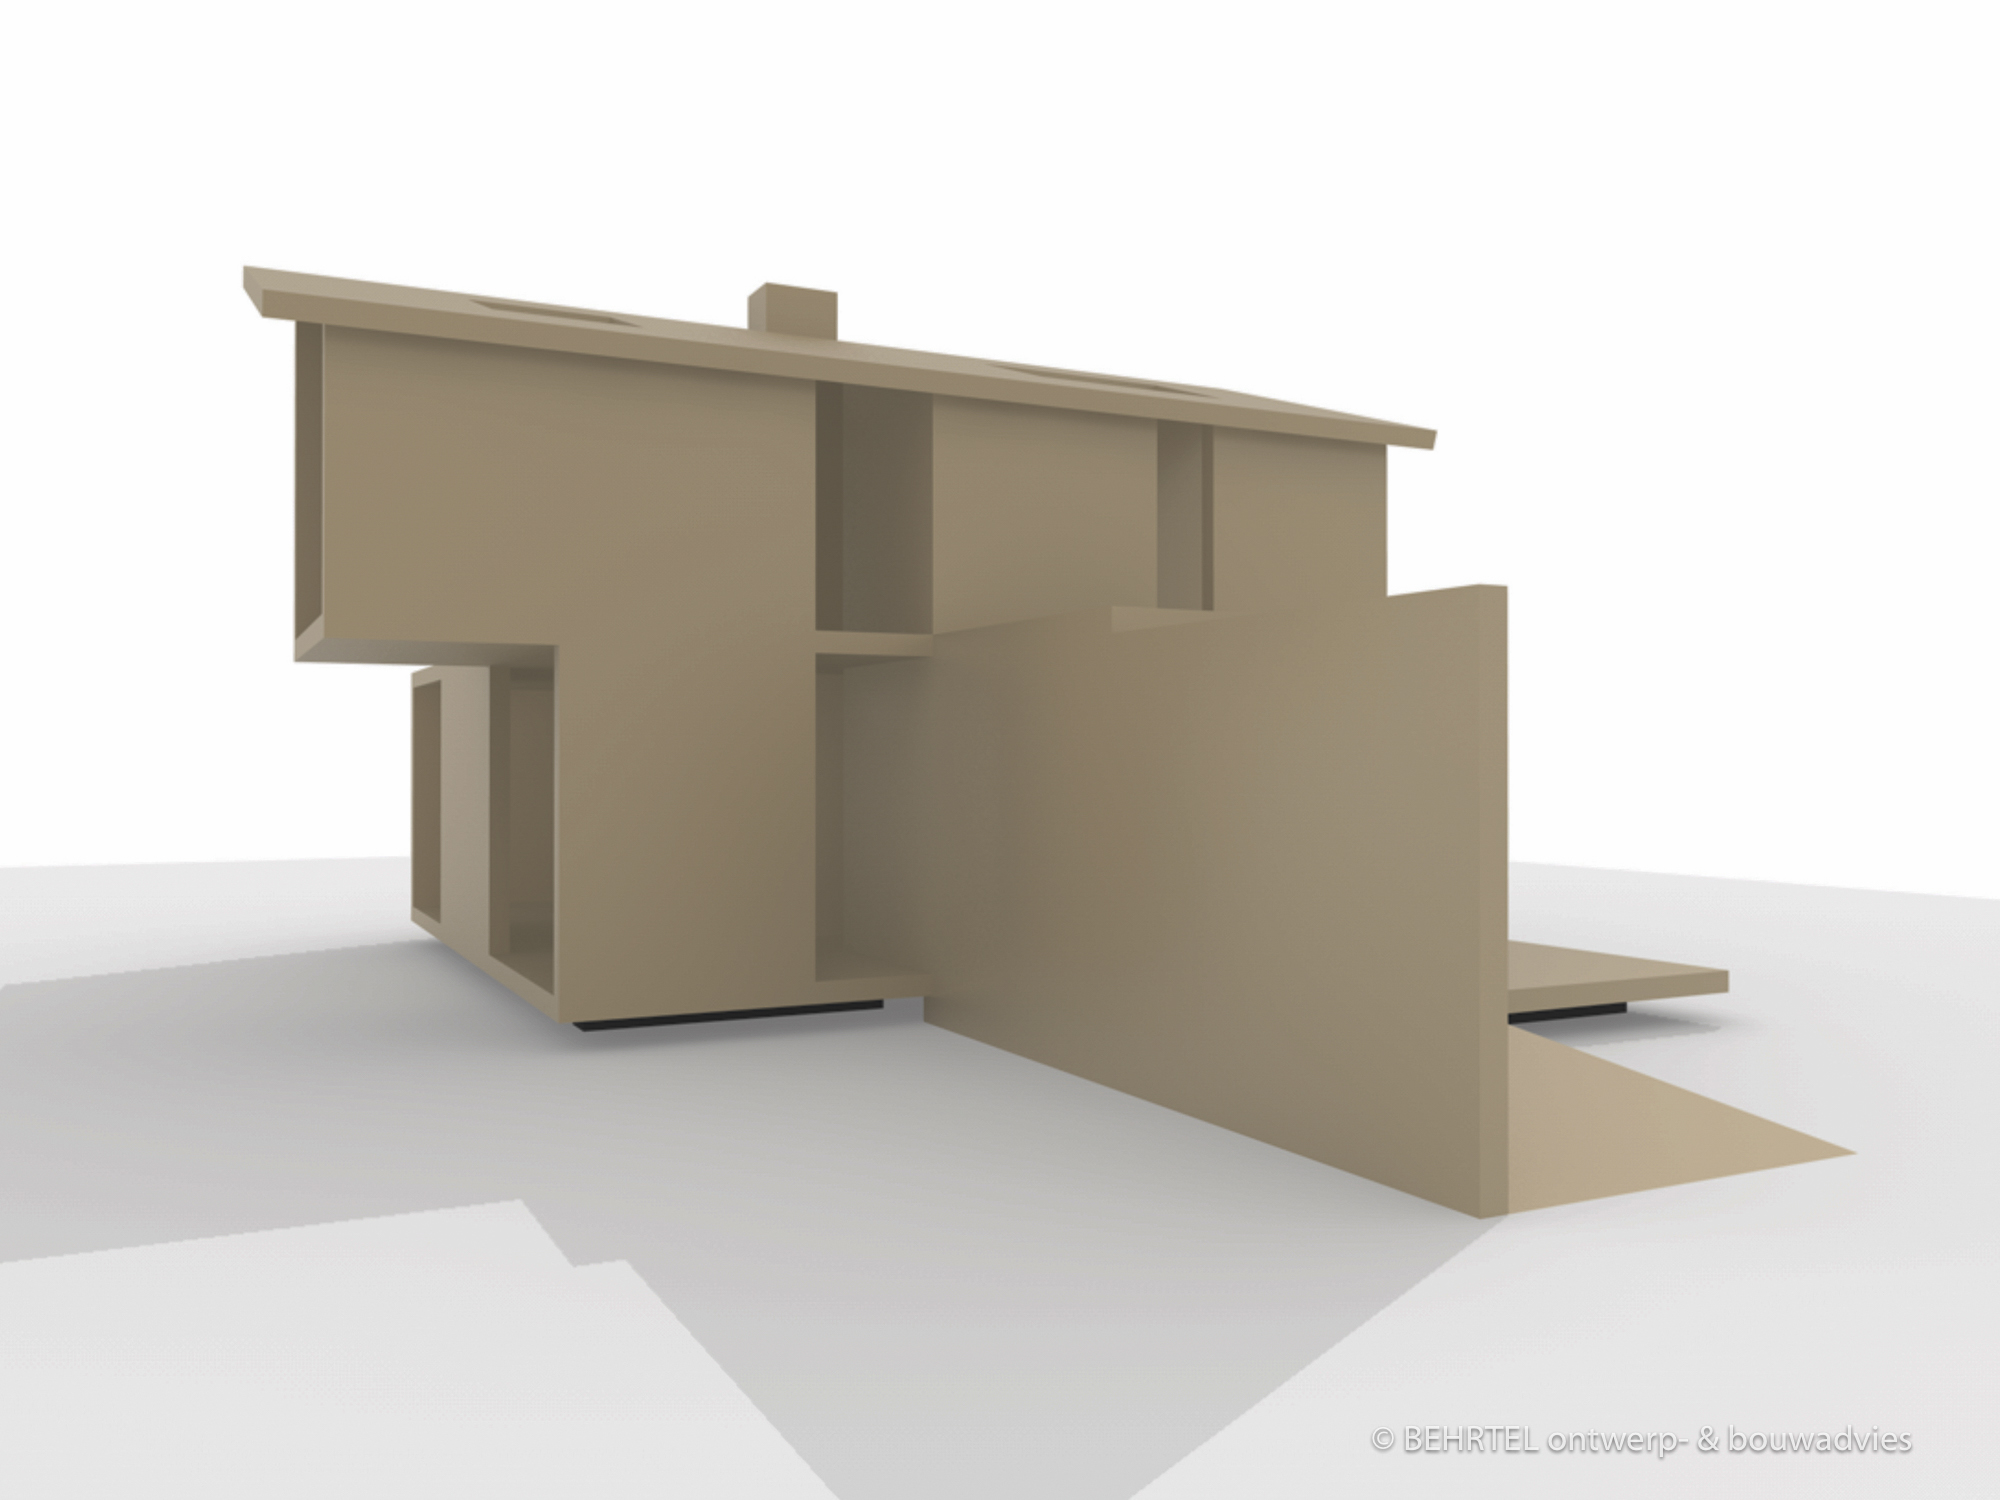 p15-004-poppenhuis-3d-4